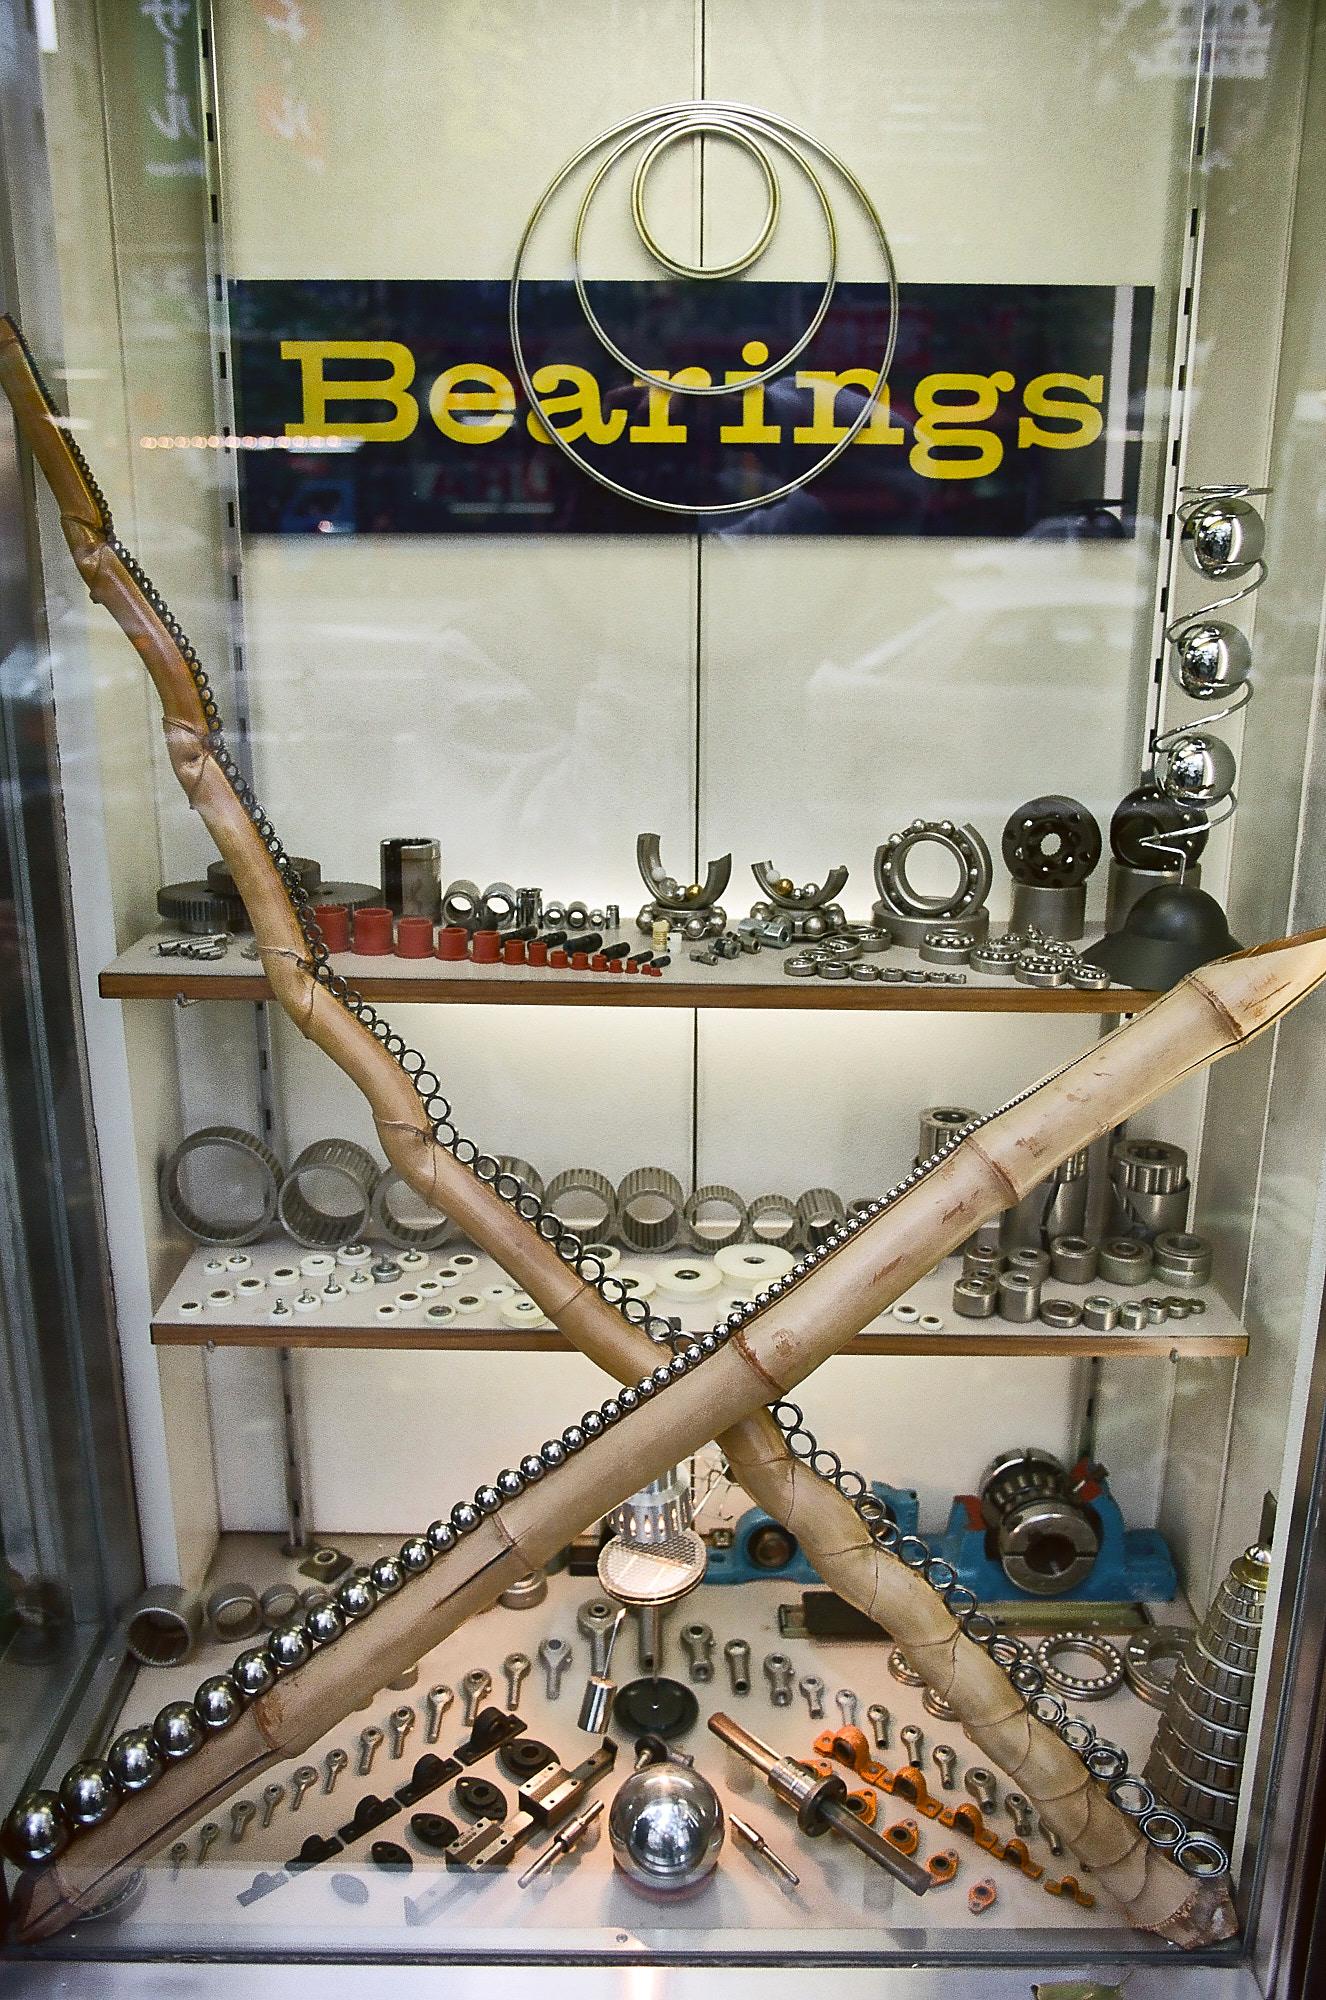 Ball bearings display